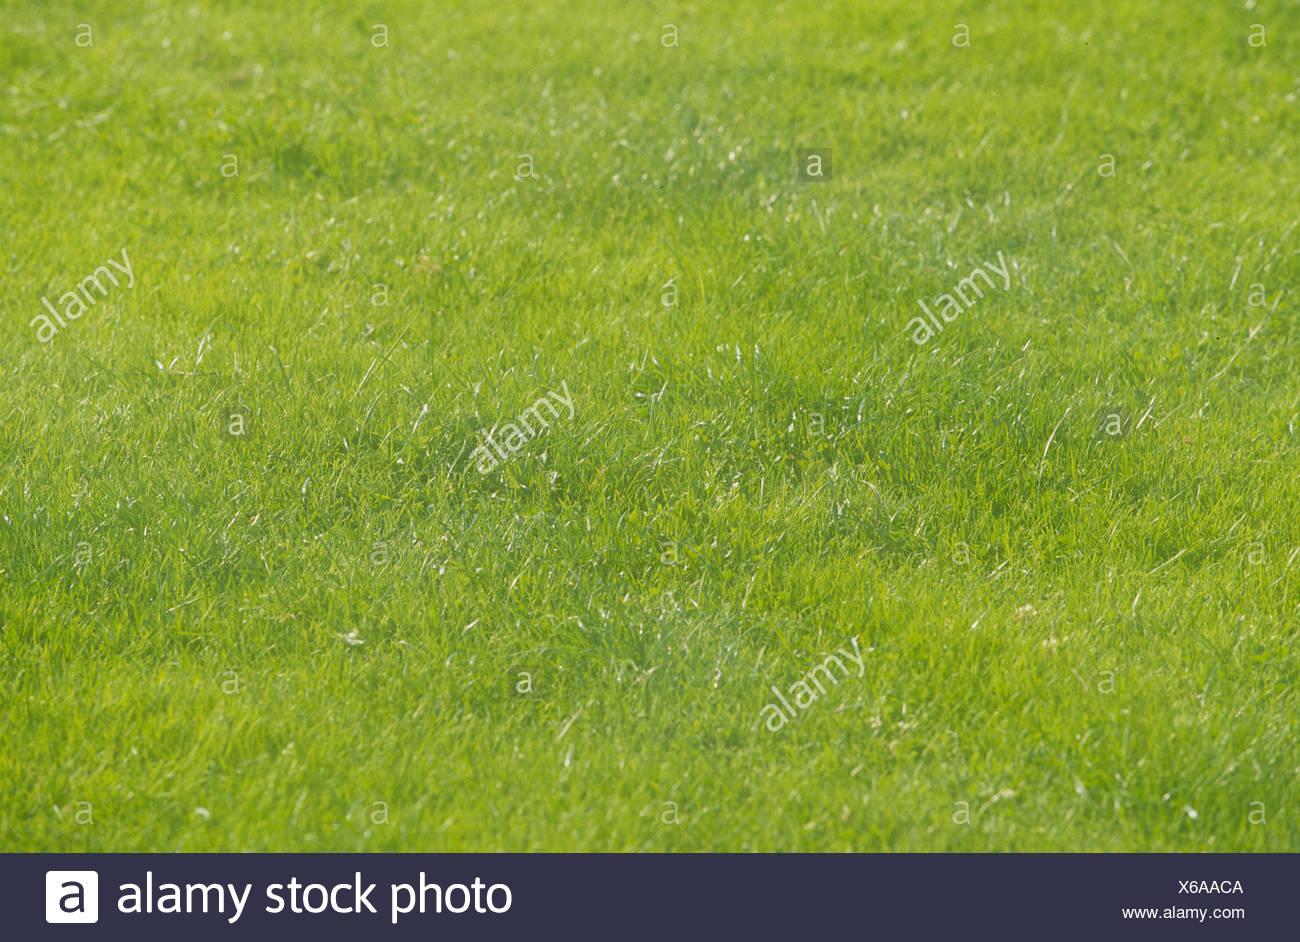 Lawn / Rasen / Wiese Stock Photo